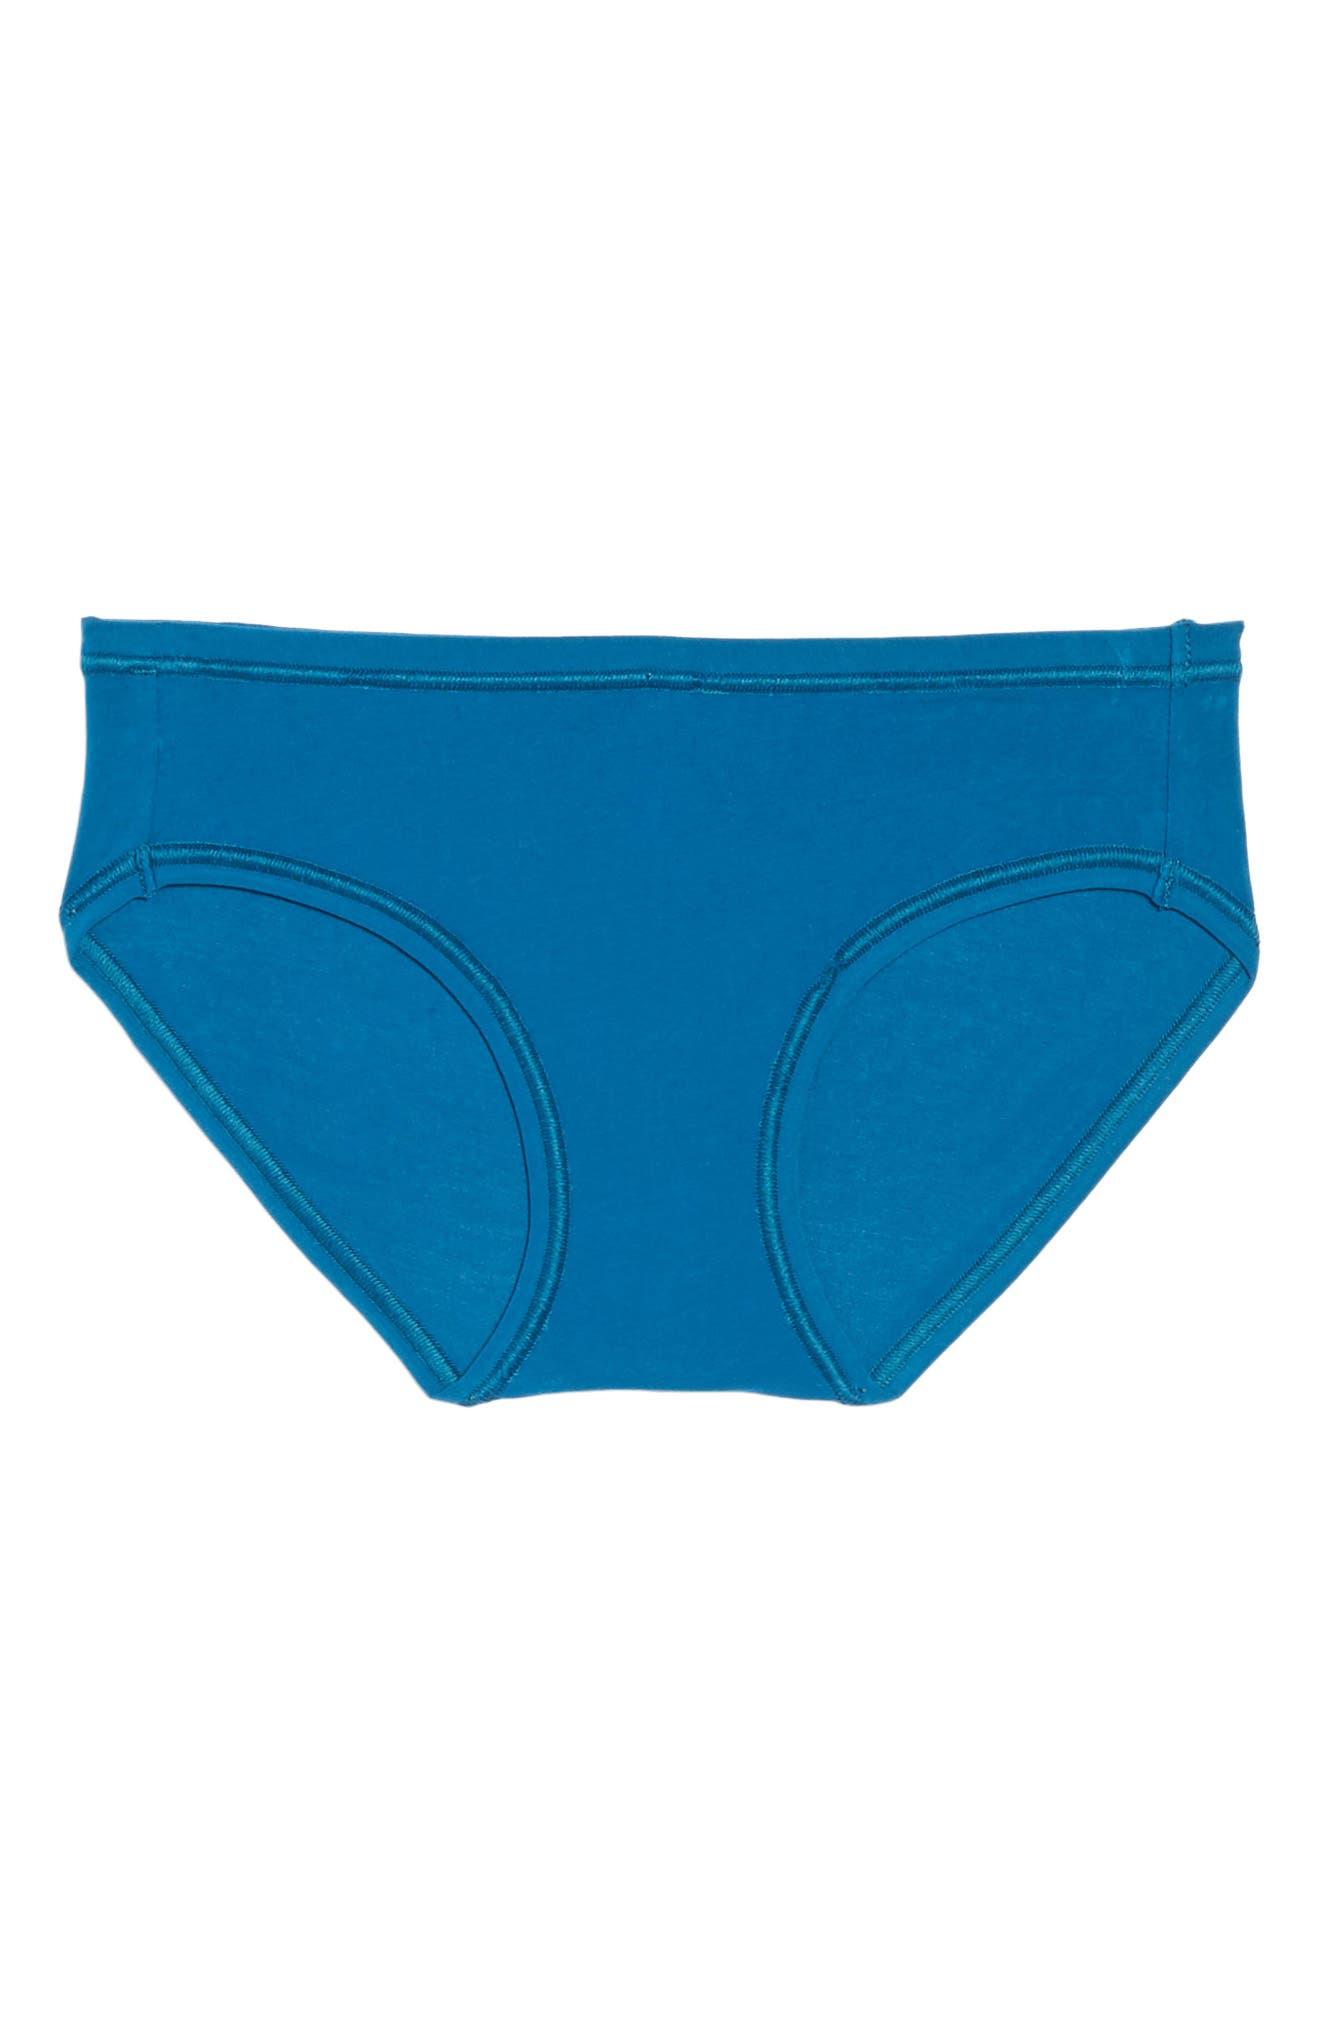 Alternate Image 4  - Wacoal B Fitting Bikini (3 for $39)